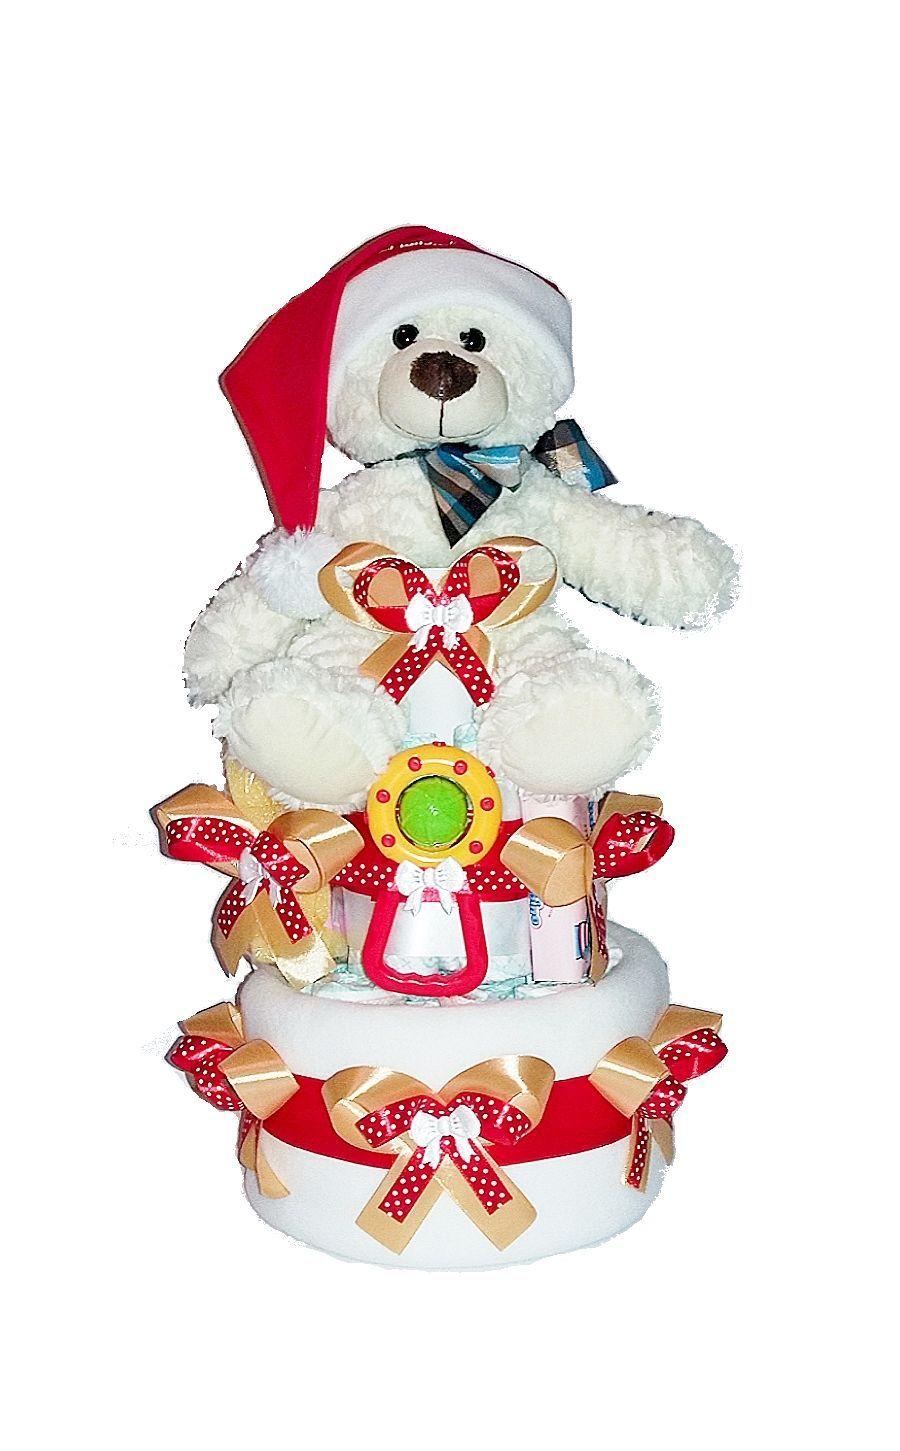 Tort Prezent Z Pampersow Czapka Mikolaja 8 Gratis 7071429257 Oficjalne Archiwum Allegro Handmade Snow Globes Decor